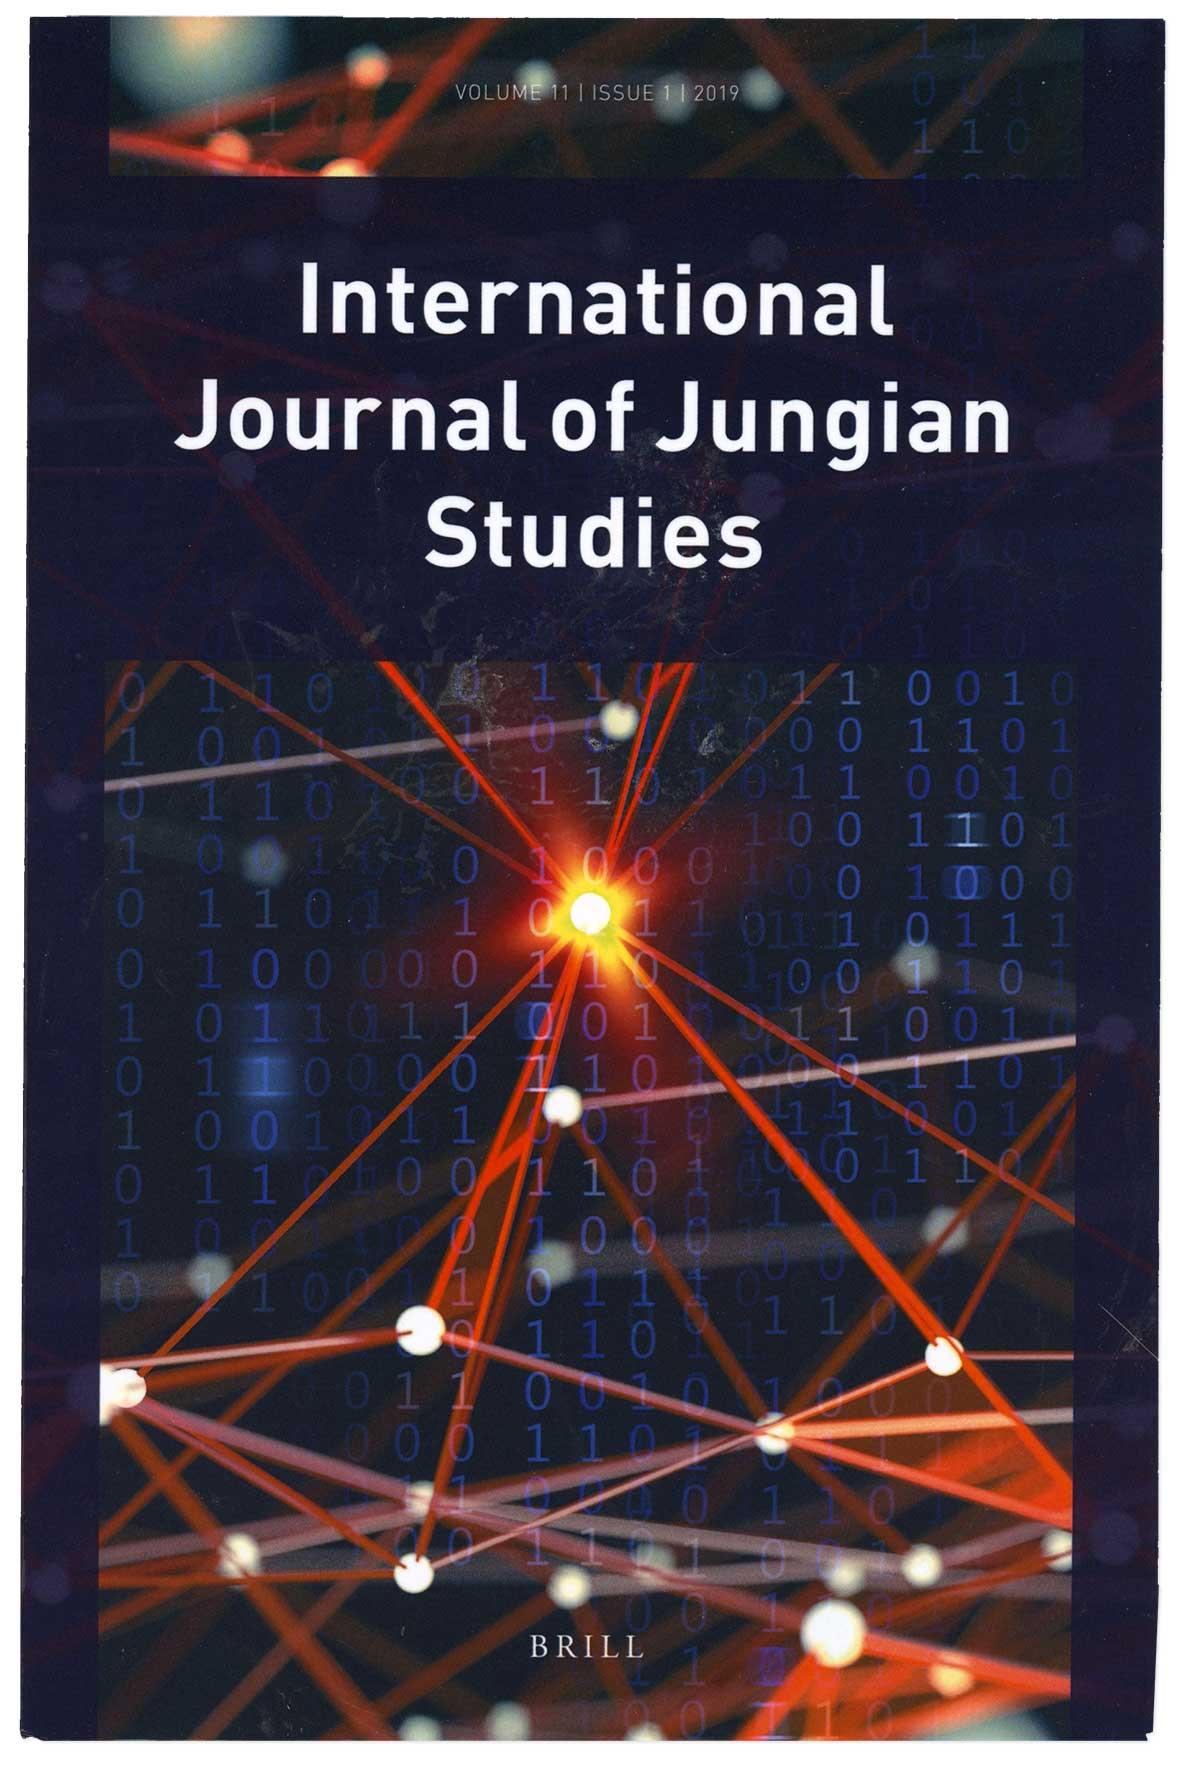 The International Journal of Jungian Studies (IJJS) Vol 11 Issue 11 2019